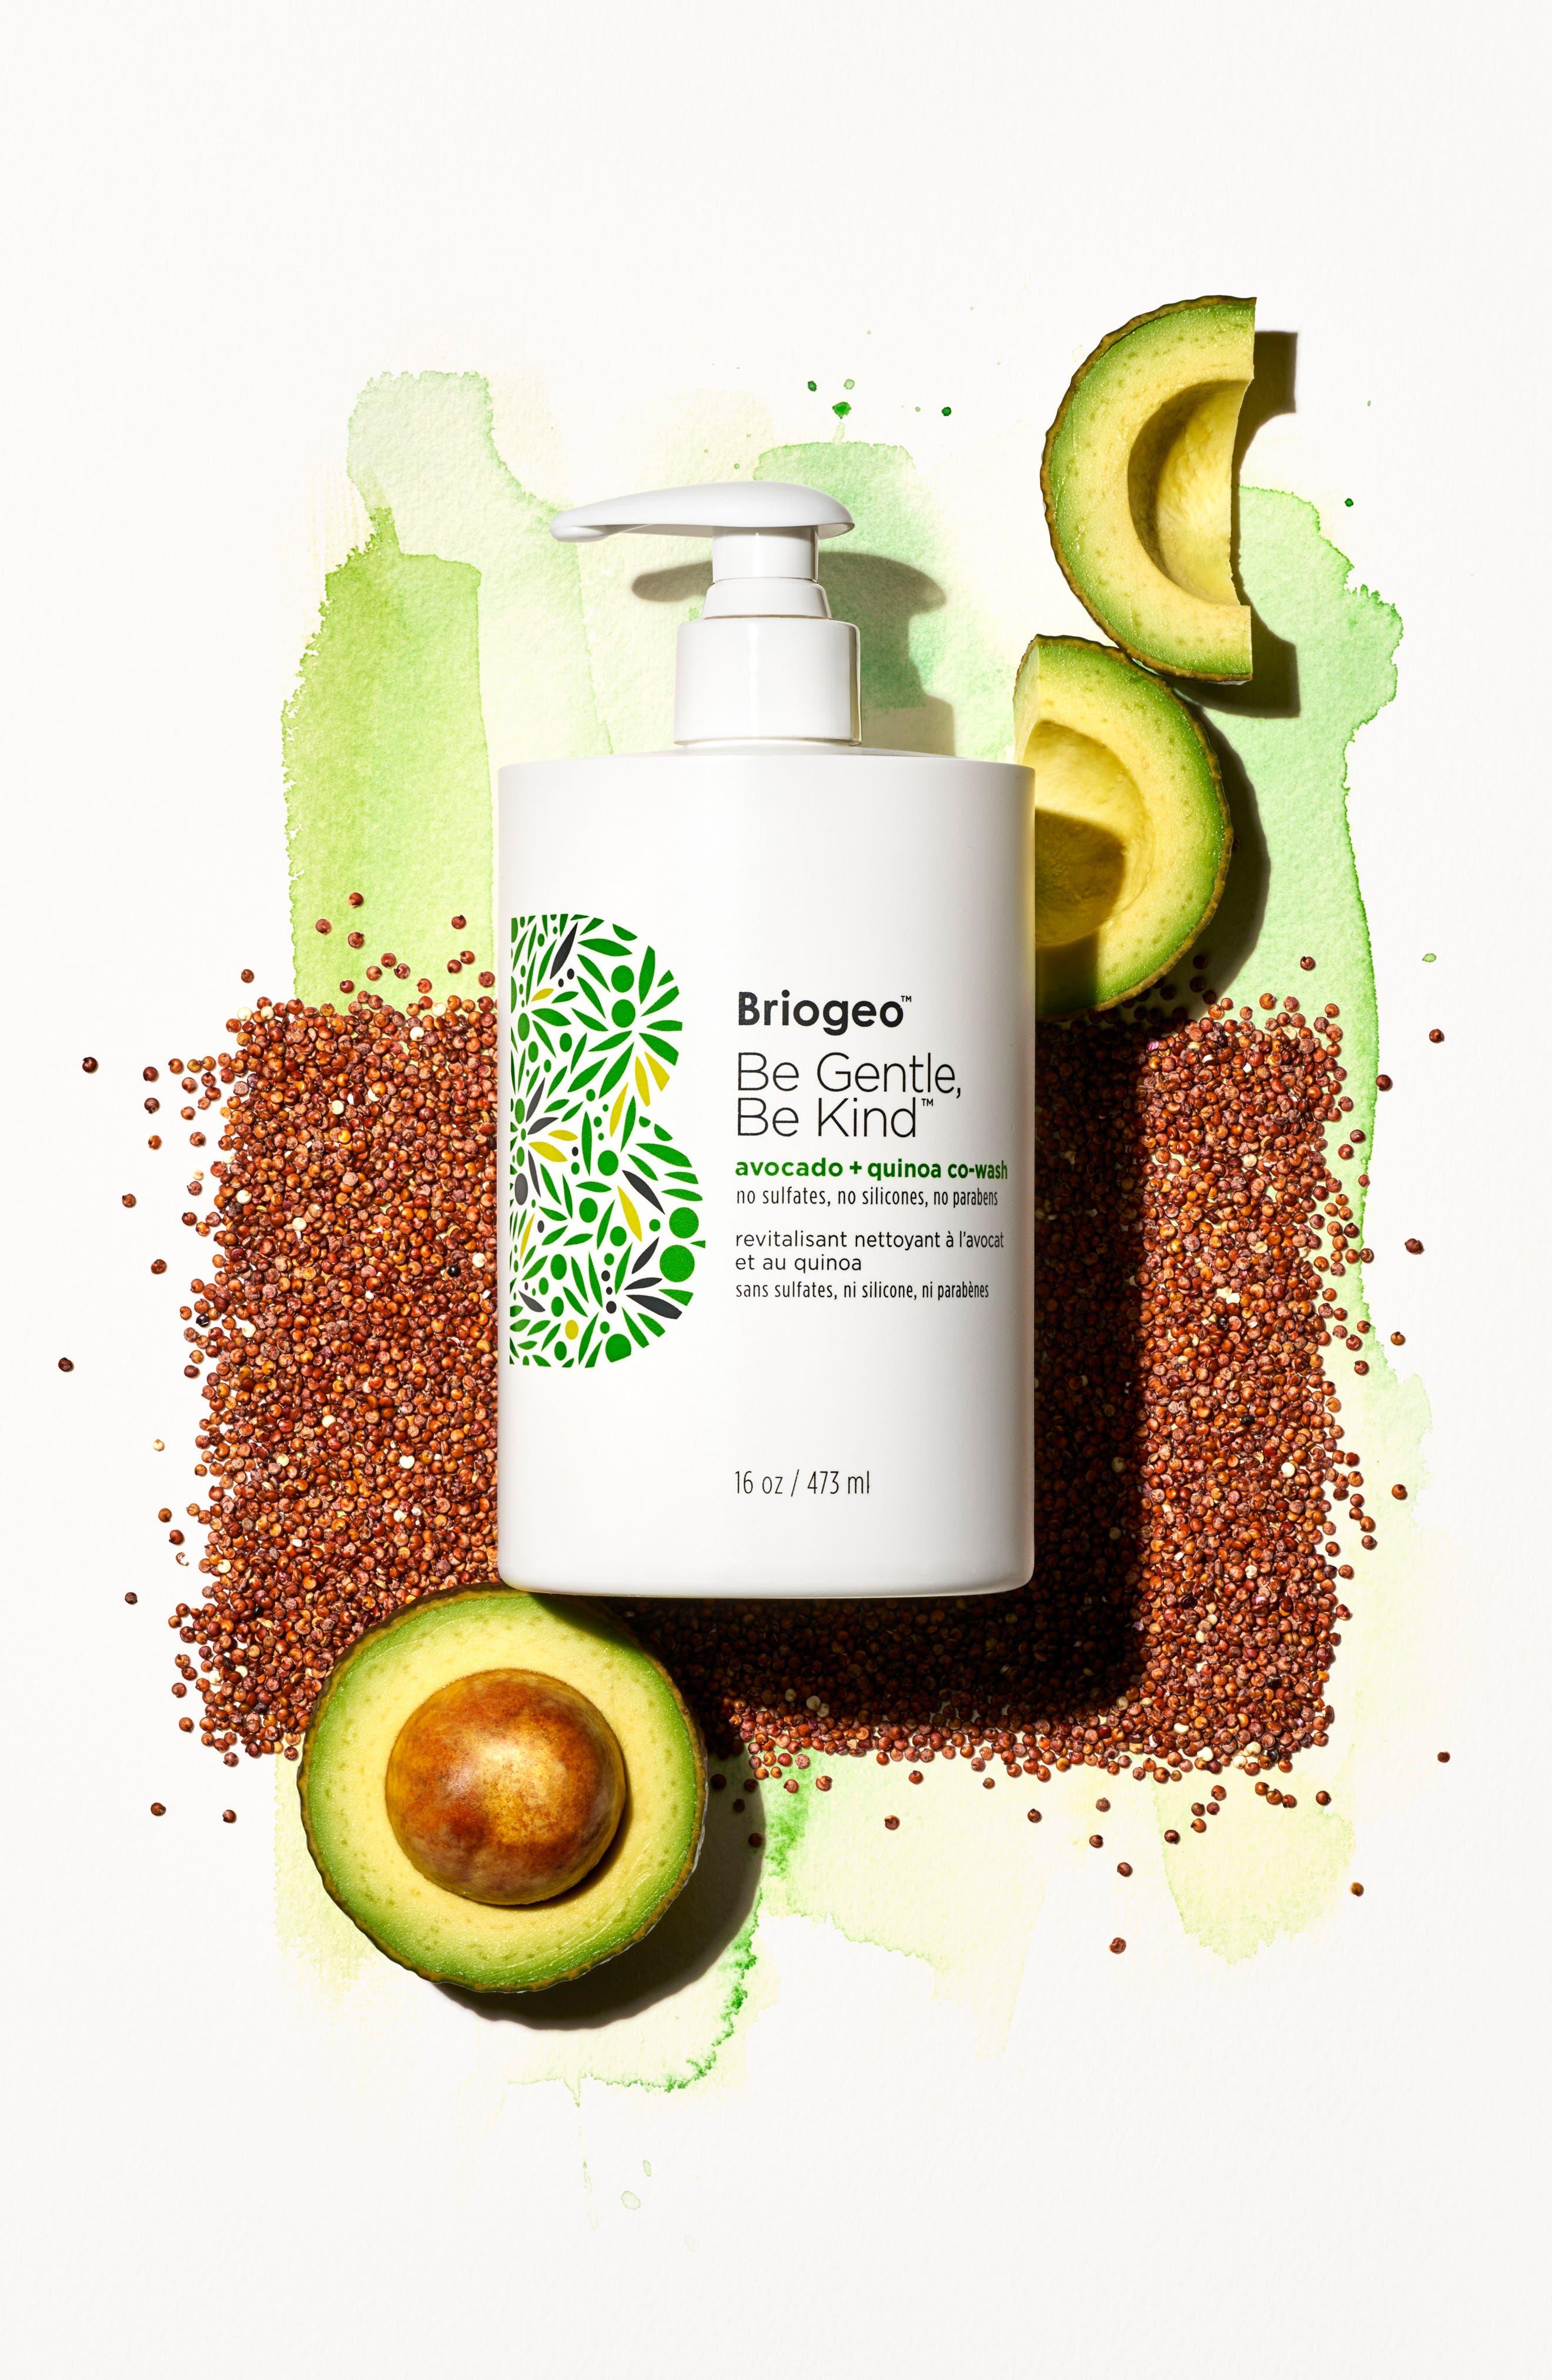 BRIOGEO, Be Gentle, Be Kind Avocado + Quinoa Co-Wash, Alternate thumbnail 4, color, NO COLOR